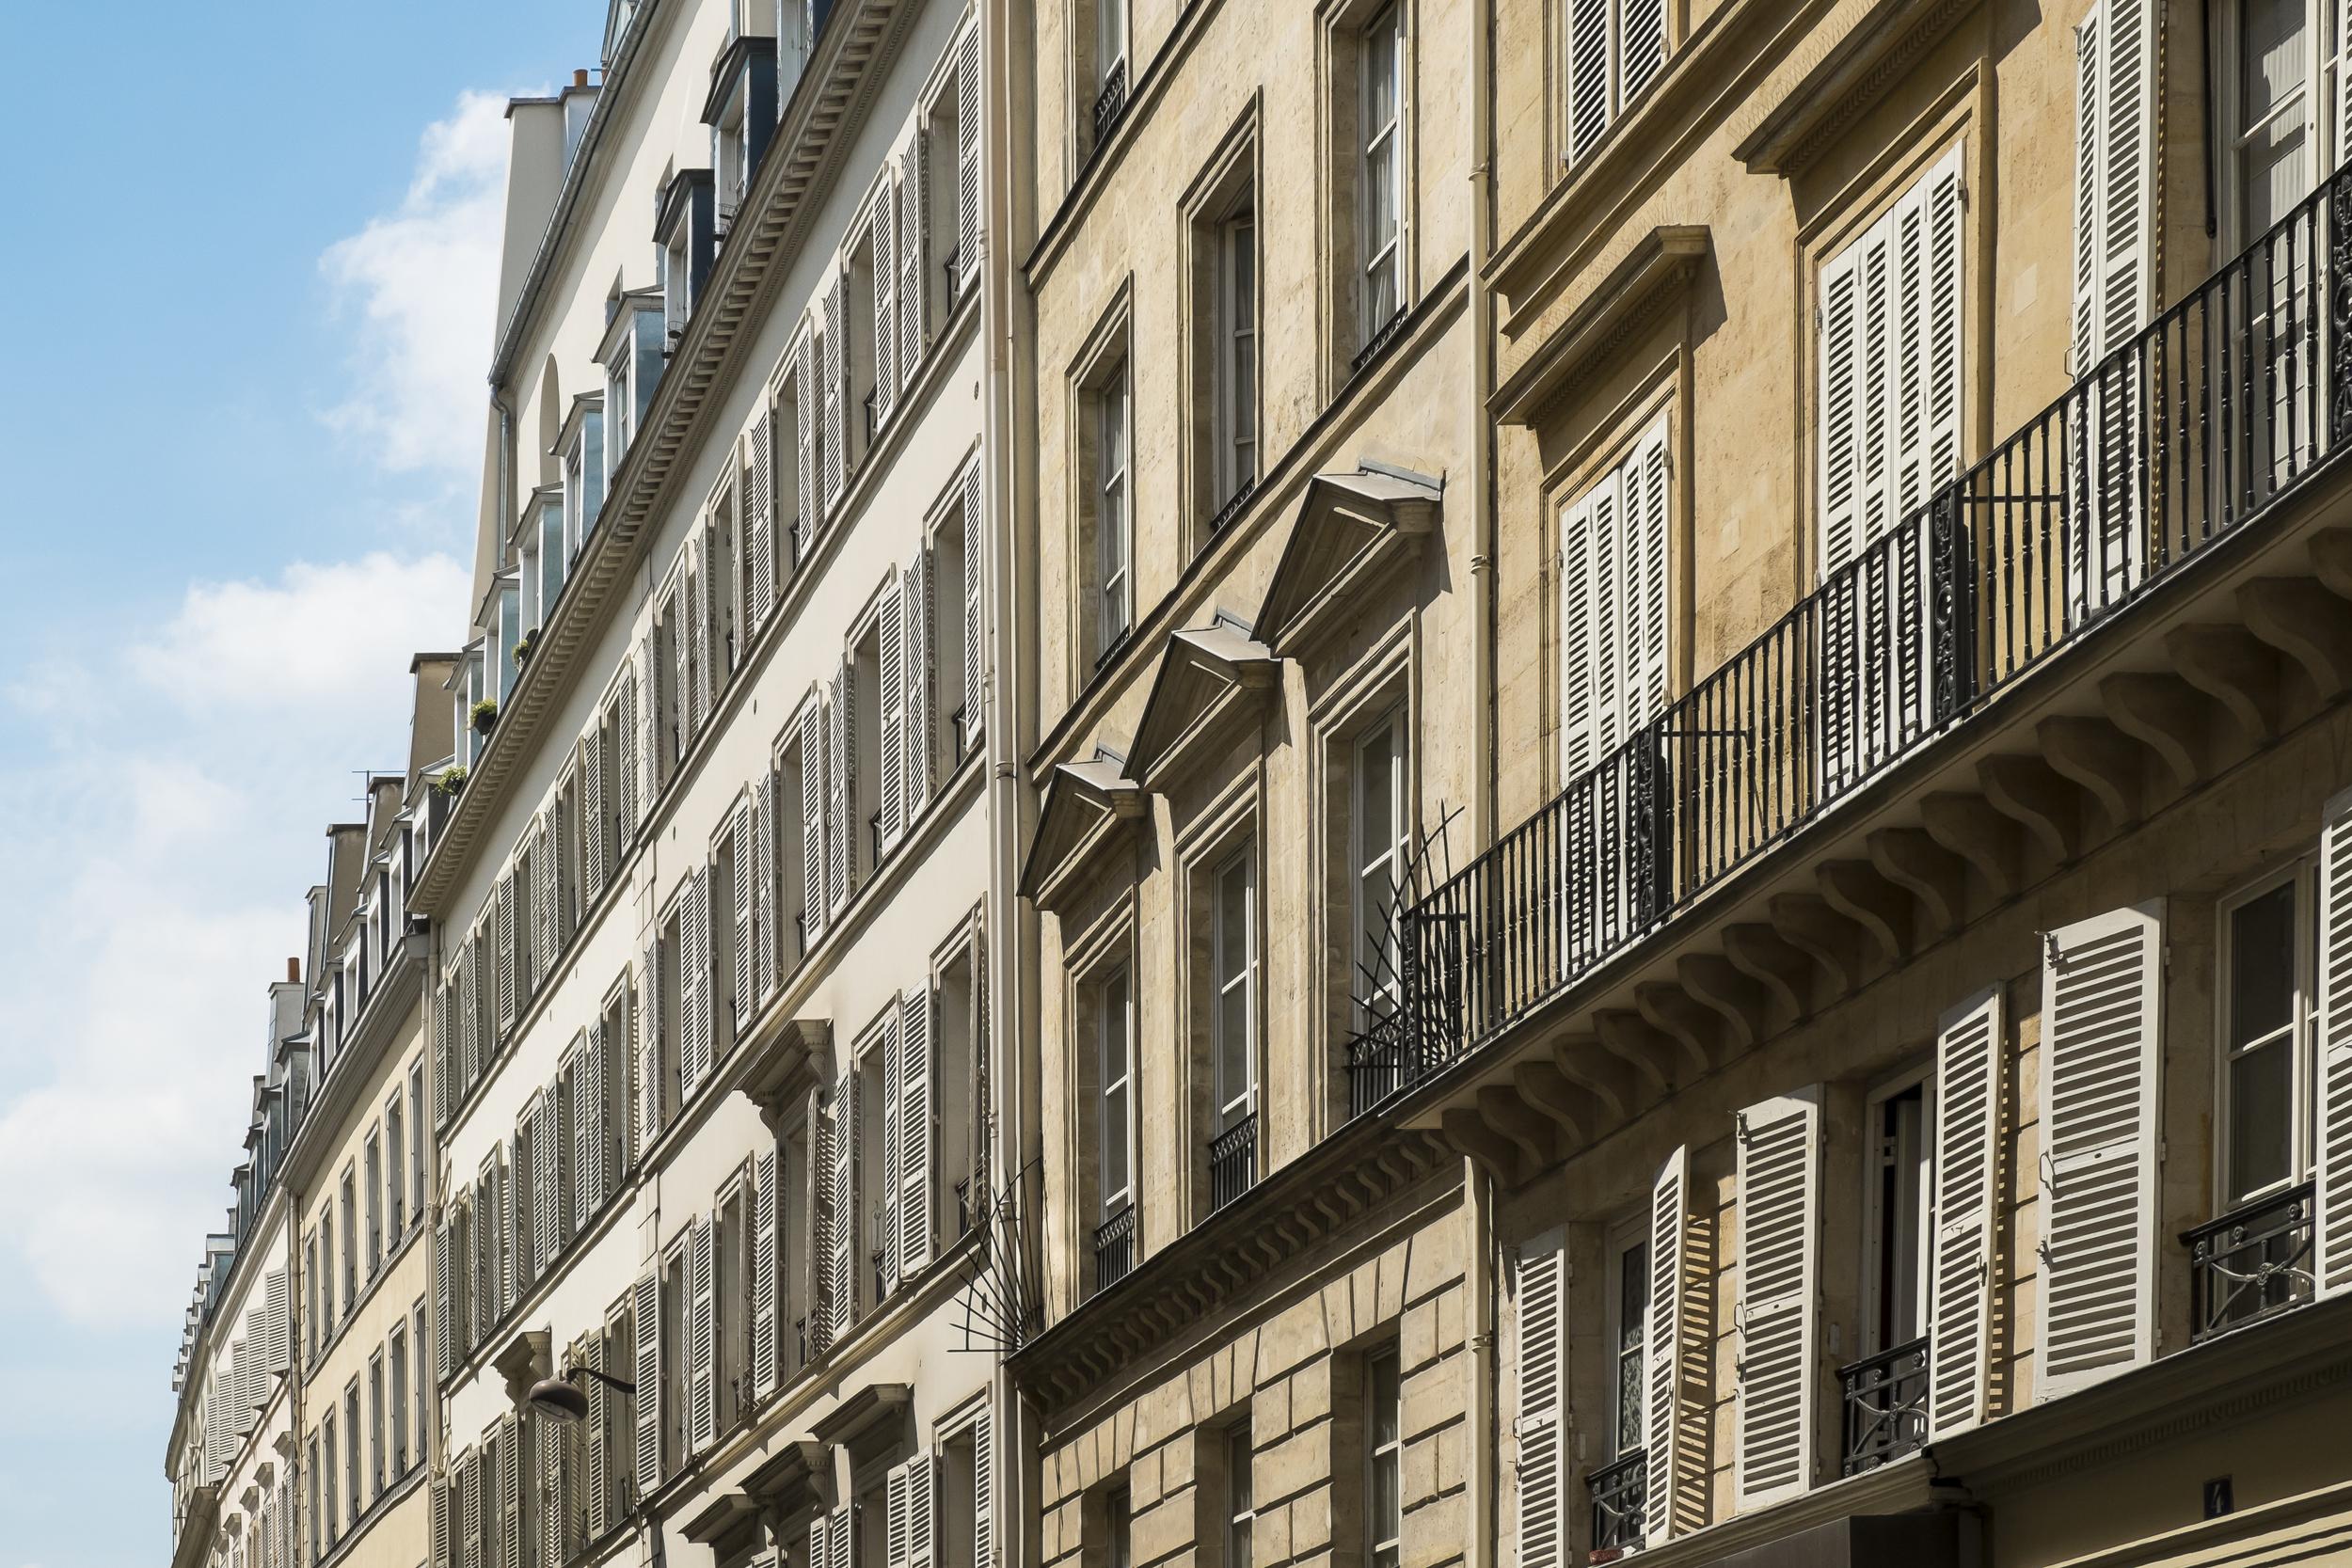 Paris-WallOfWindows-20130706-DSCF3435.jpg